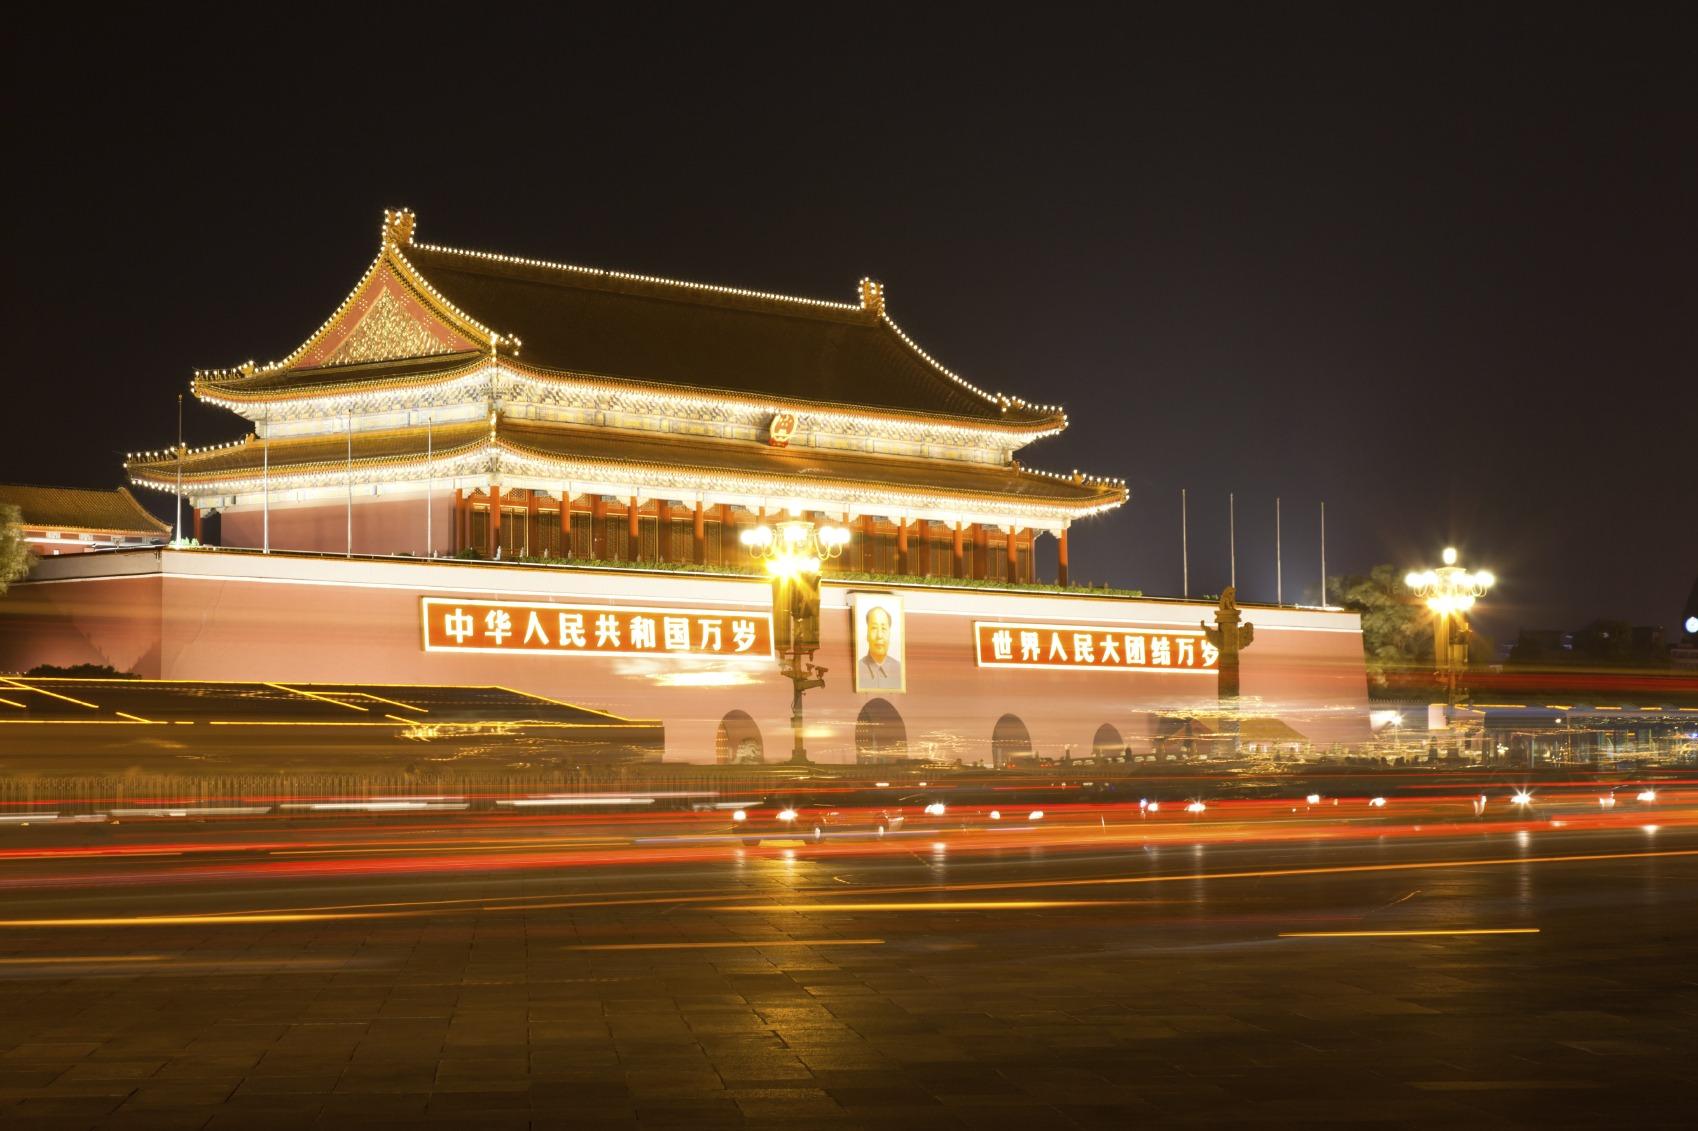 tiananmen-square-china.jpg